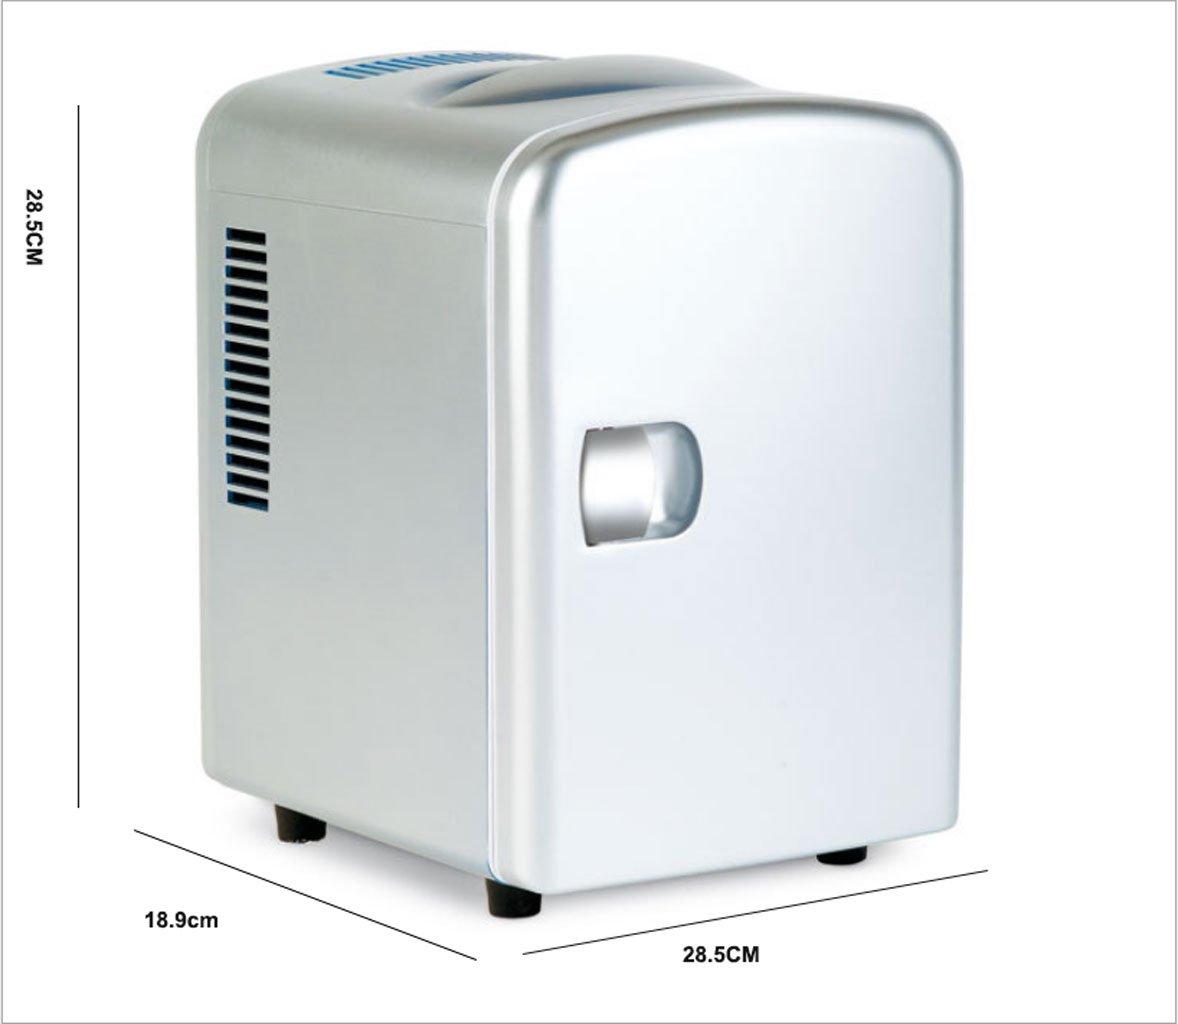 BX Mini Nevera Refrigerador para automóvil 4L, portátil, Control ...